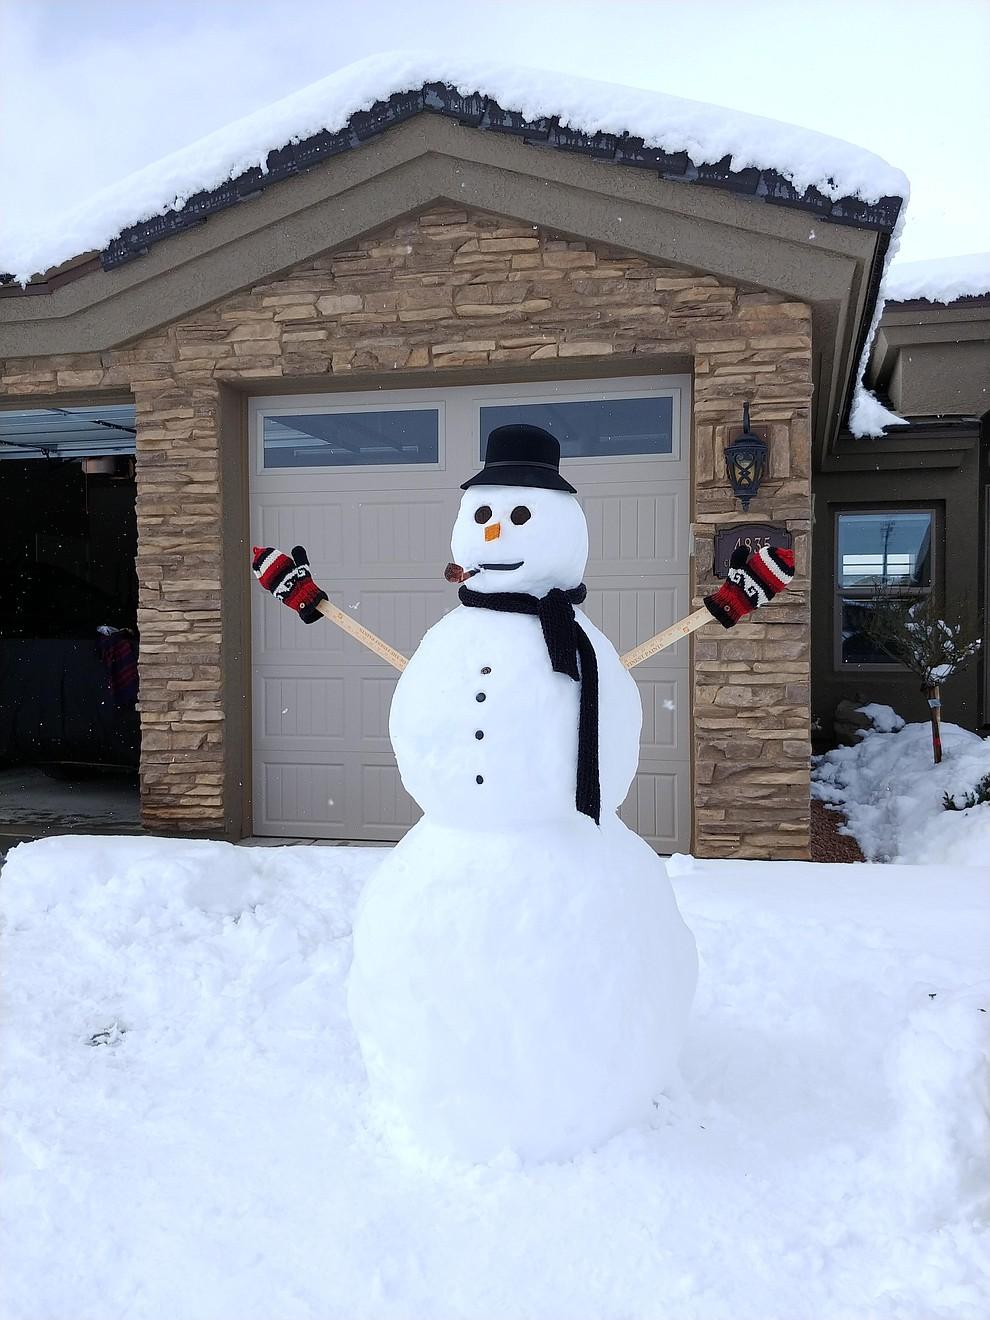 Friendly neighborhood snowman. (Photo submitted by Brian Bakunowski)